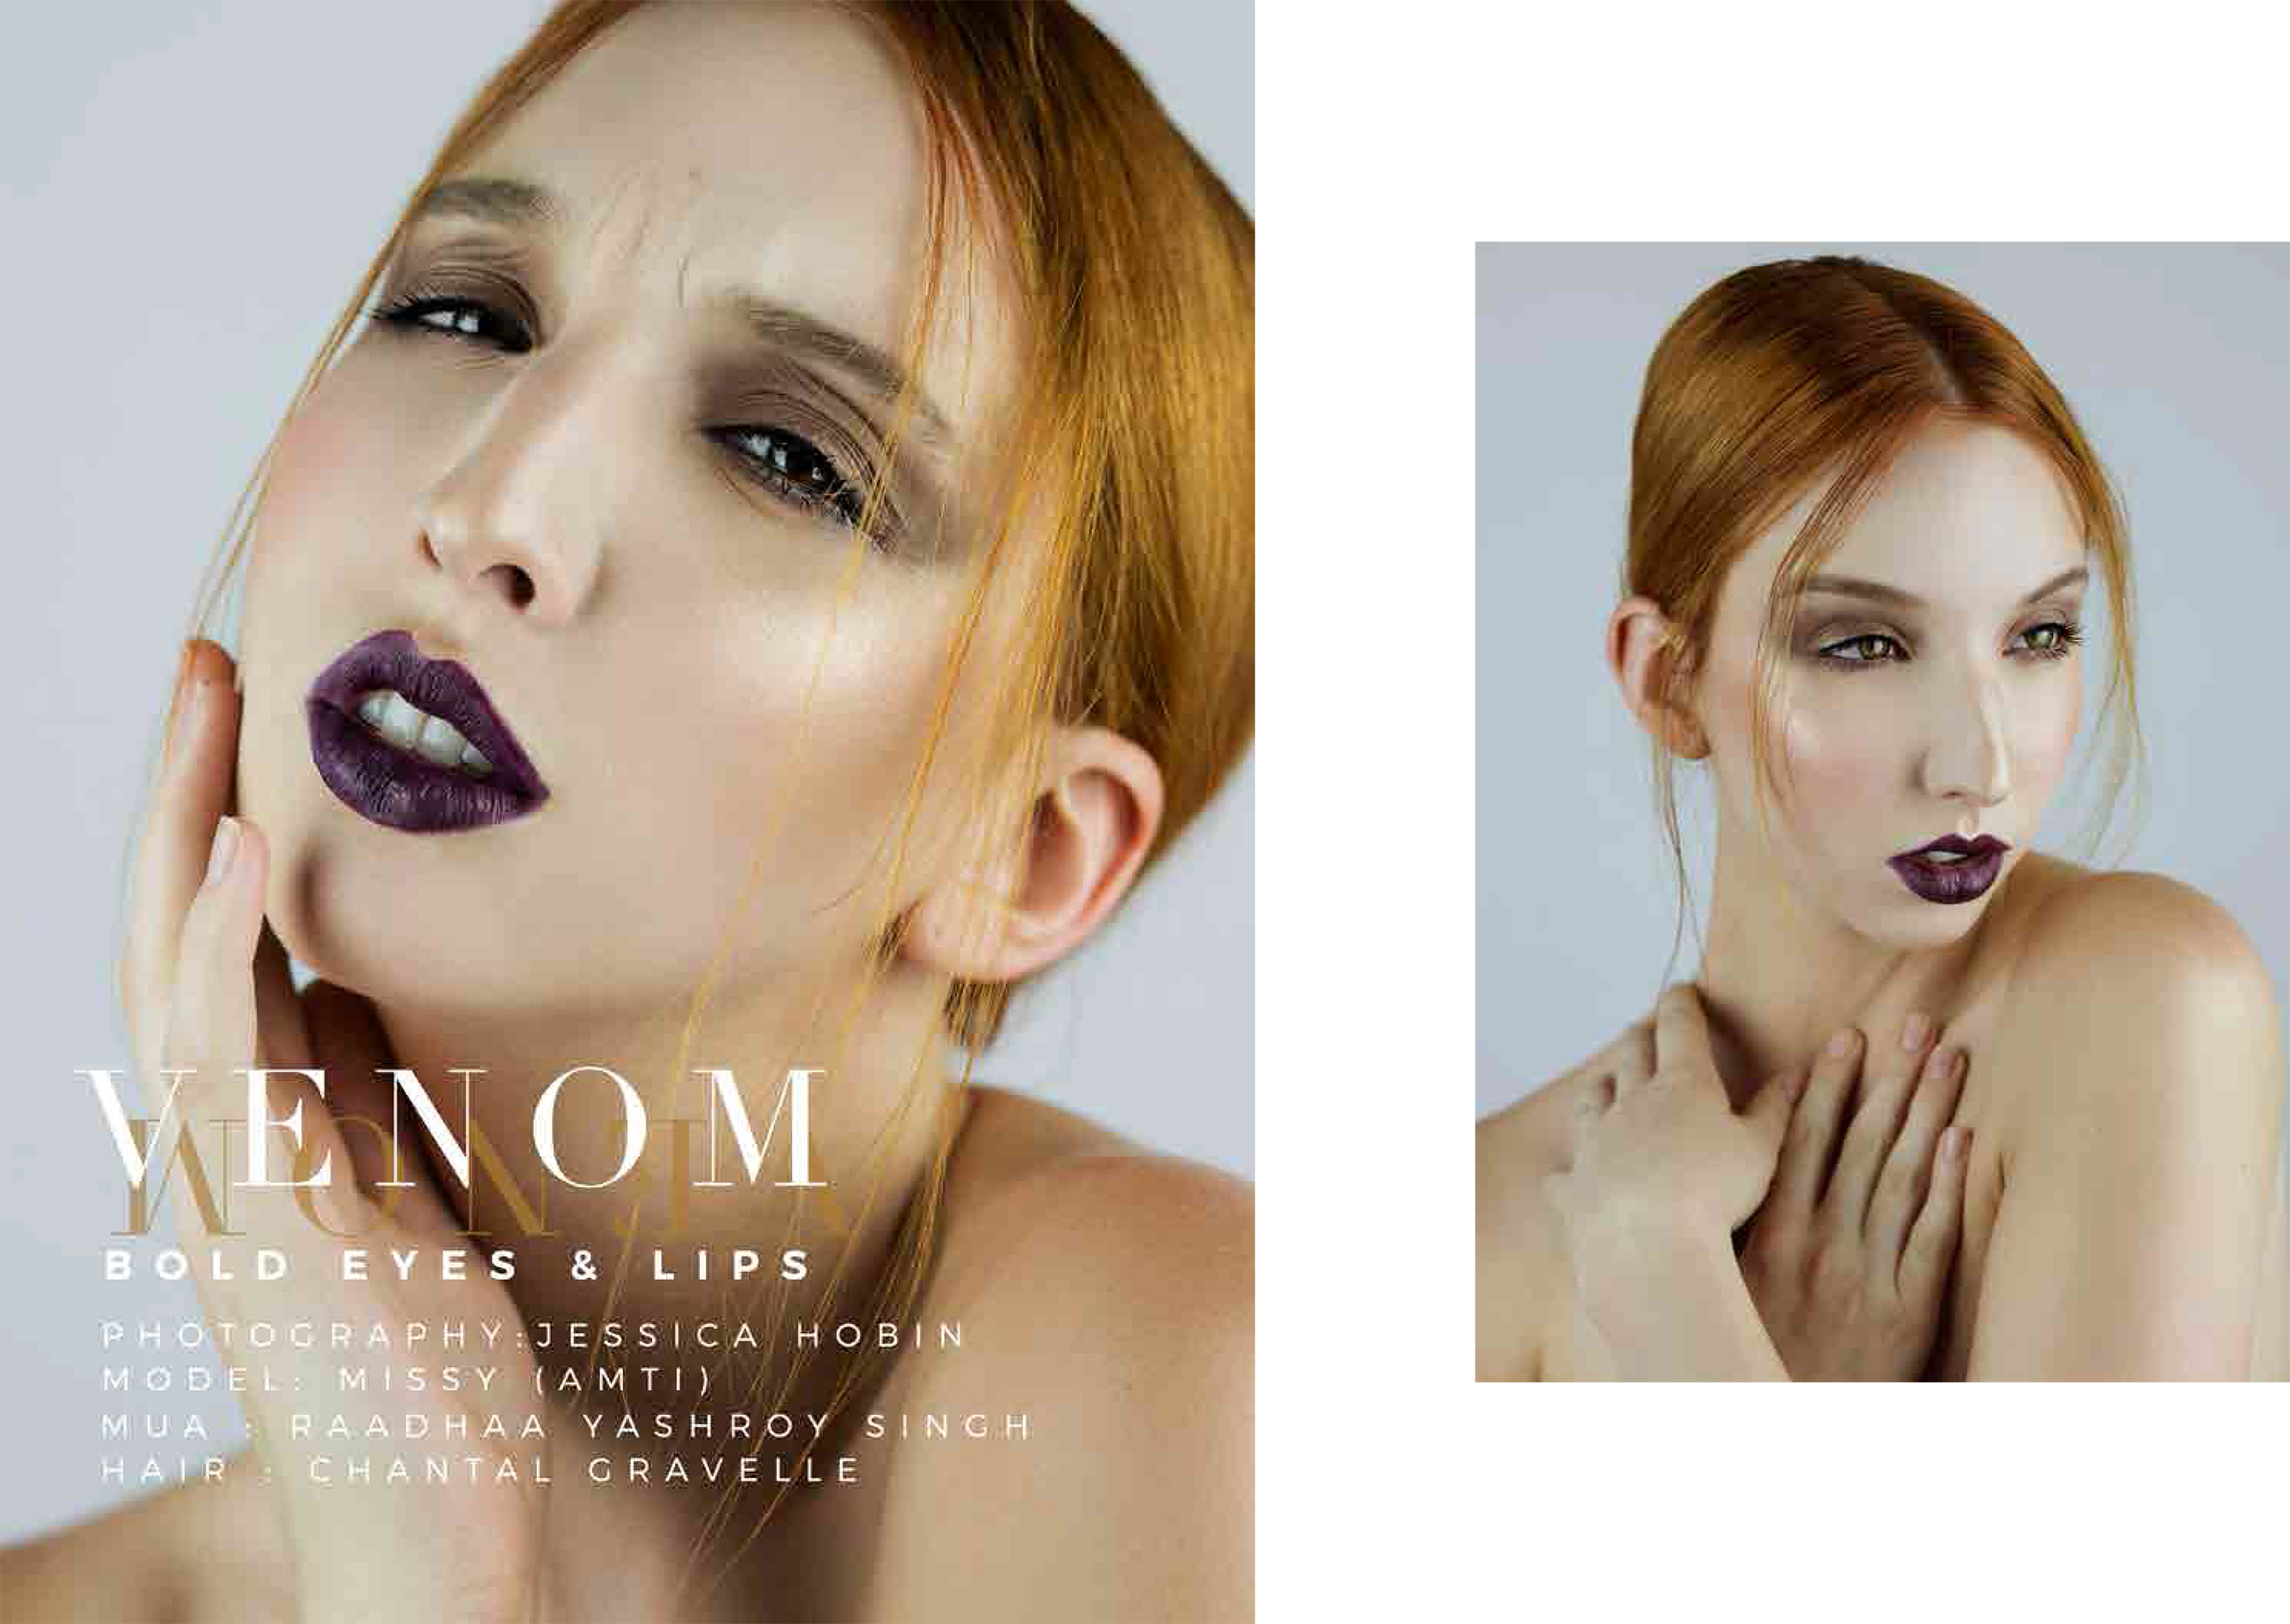 venom - Krowd Magazine